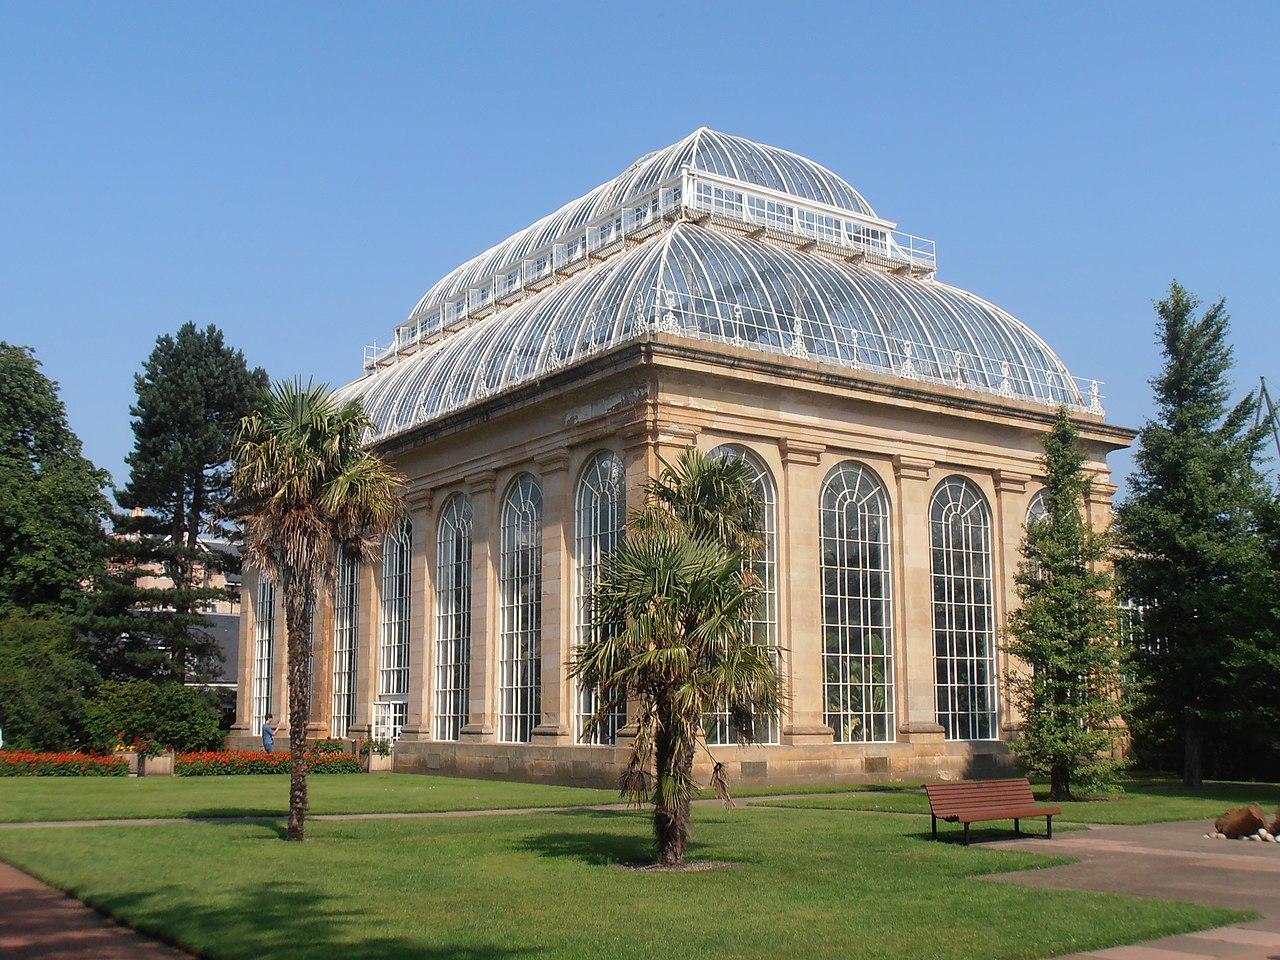 file palm house royal botanic garden edinburgh jpg wikimedia commons